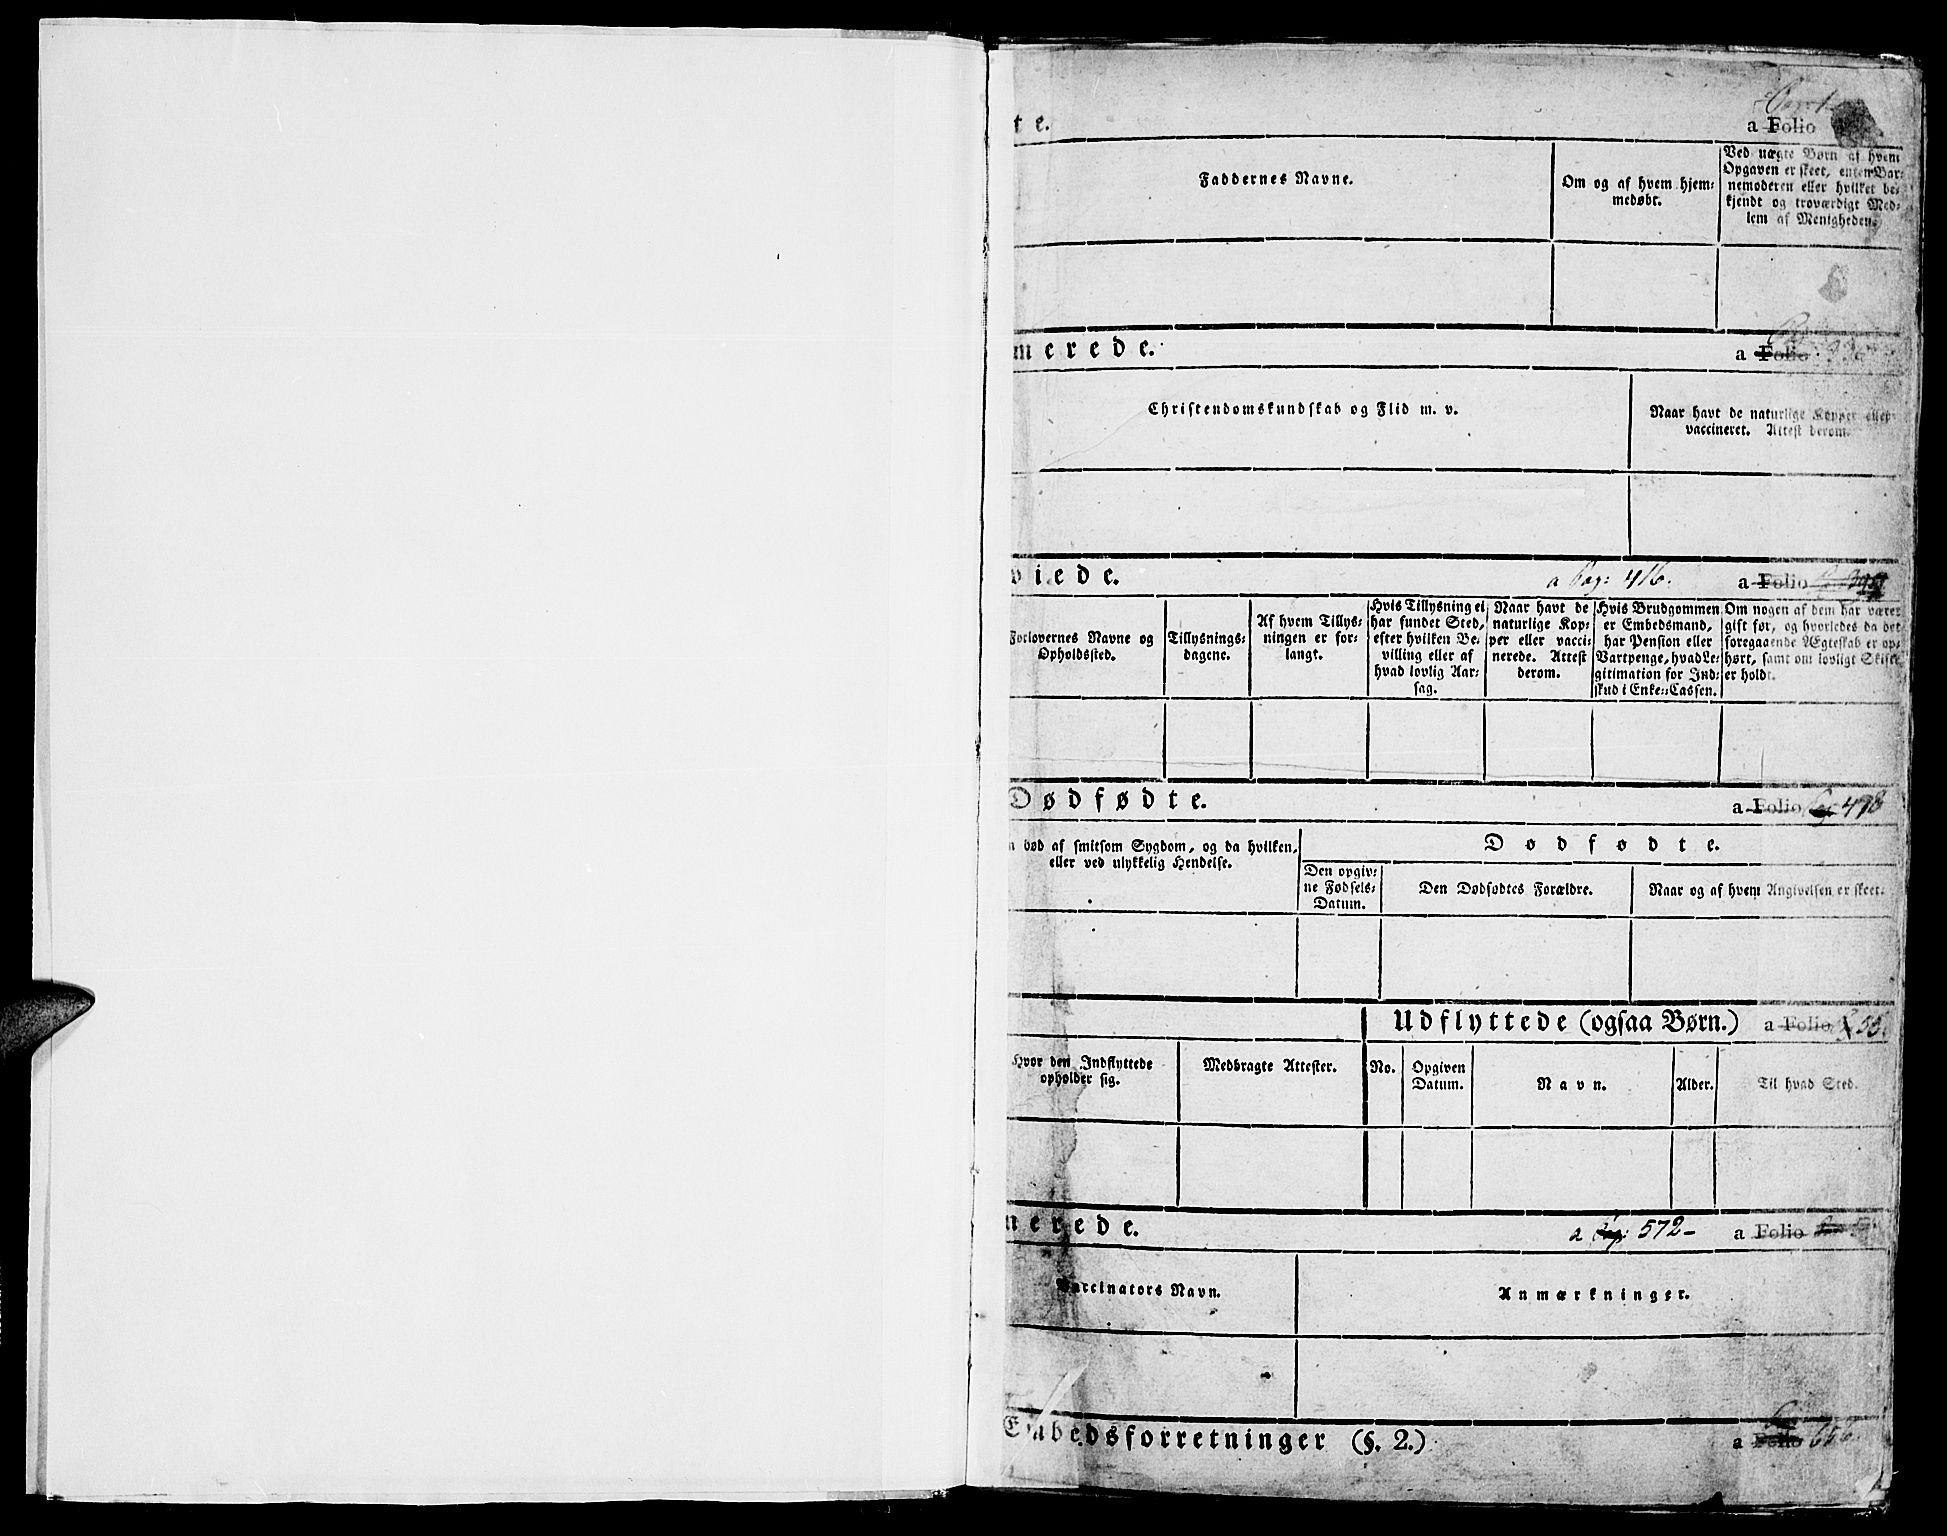 SAH, Lom prestekontor, K/L0005: Ministerialbok nr. 5, 1825-1837